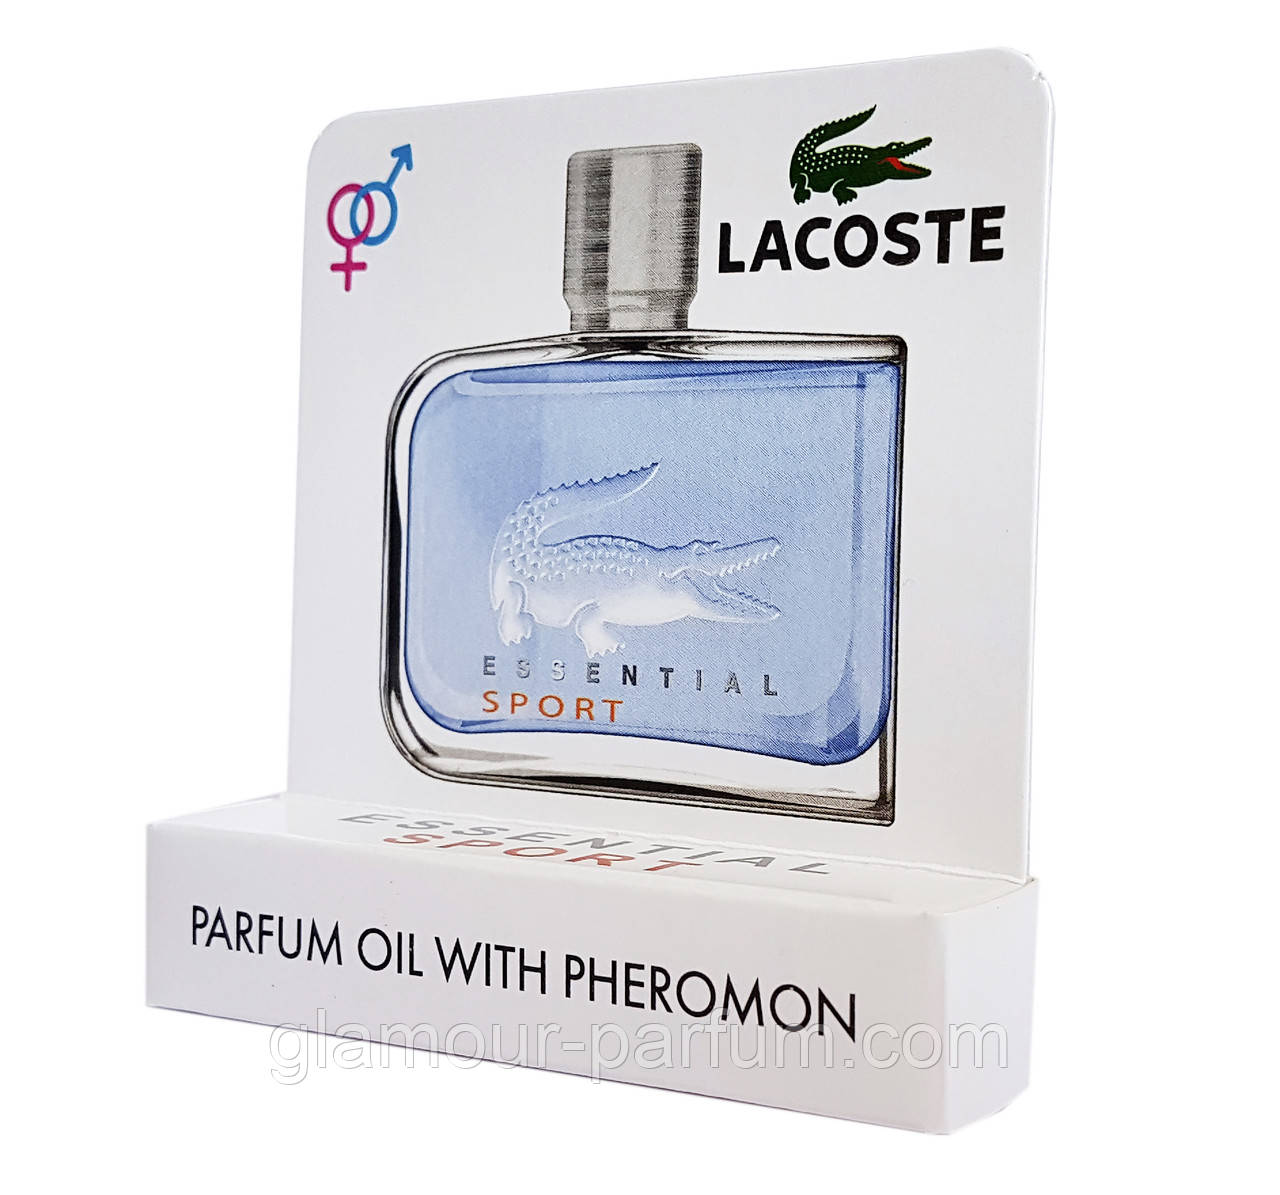 Мини парфюм с феромонами Lacoste Essential Sport Pour Homme (Лакост Эсэншал Спорт) 5 мл  (реплика)